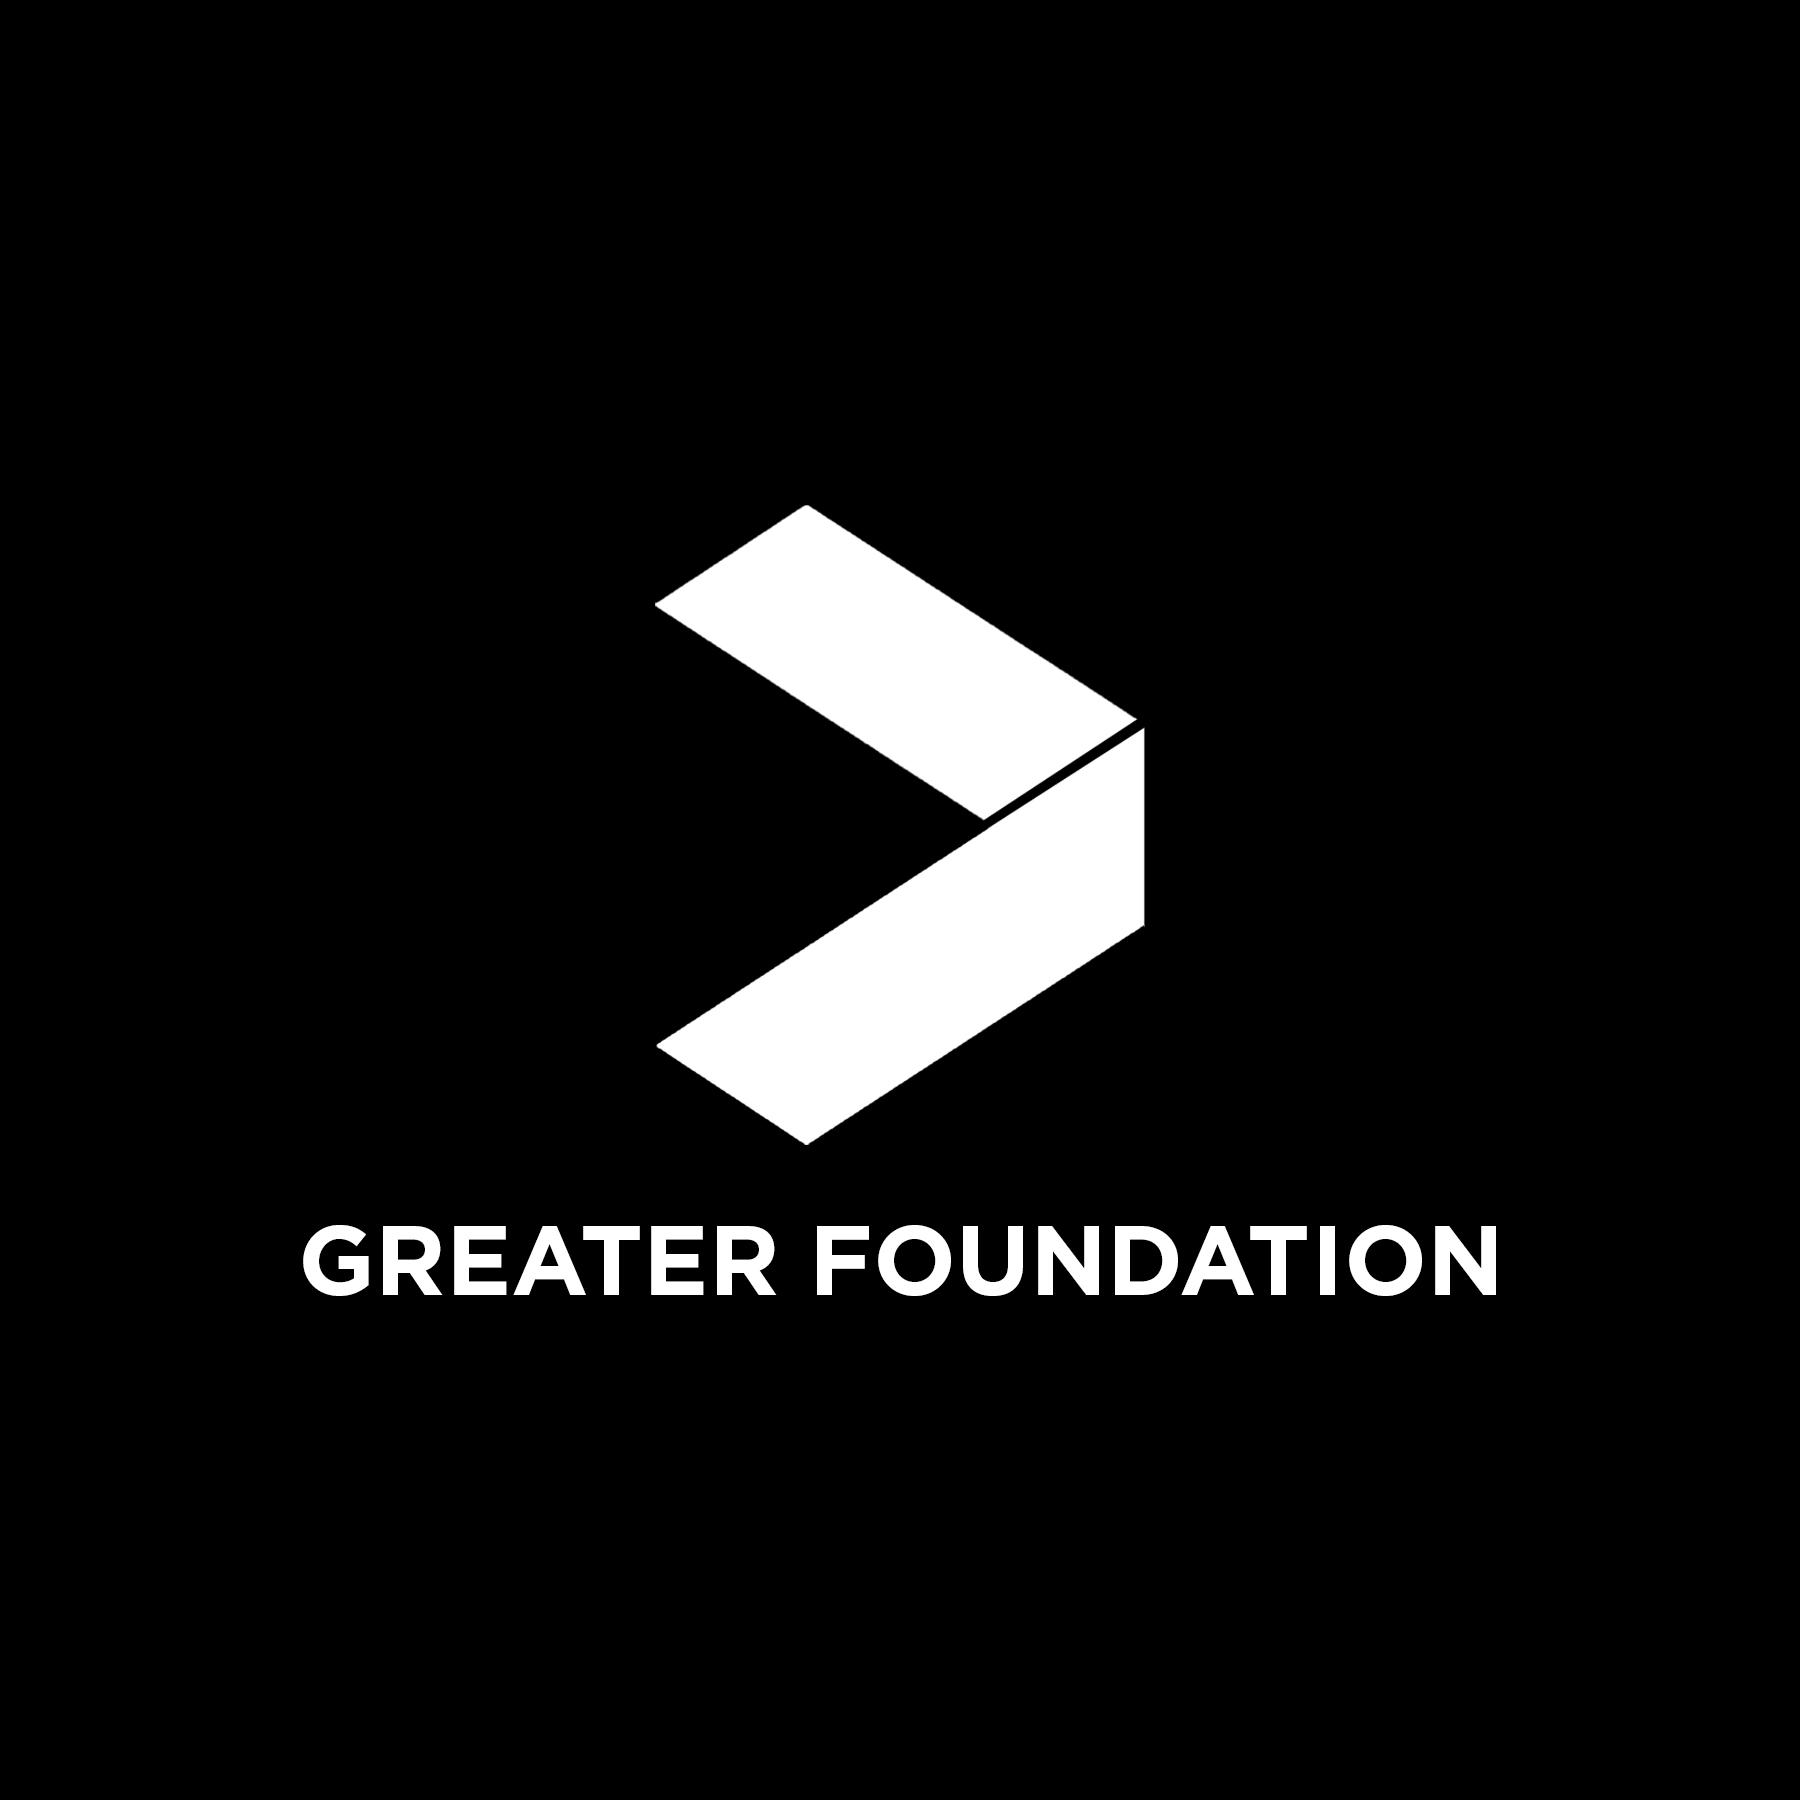 GreaterFoundation.jpg